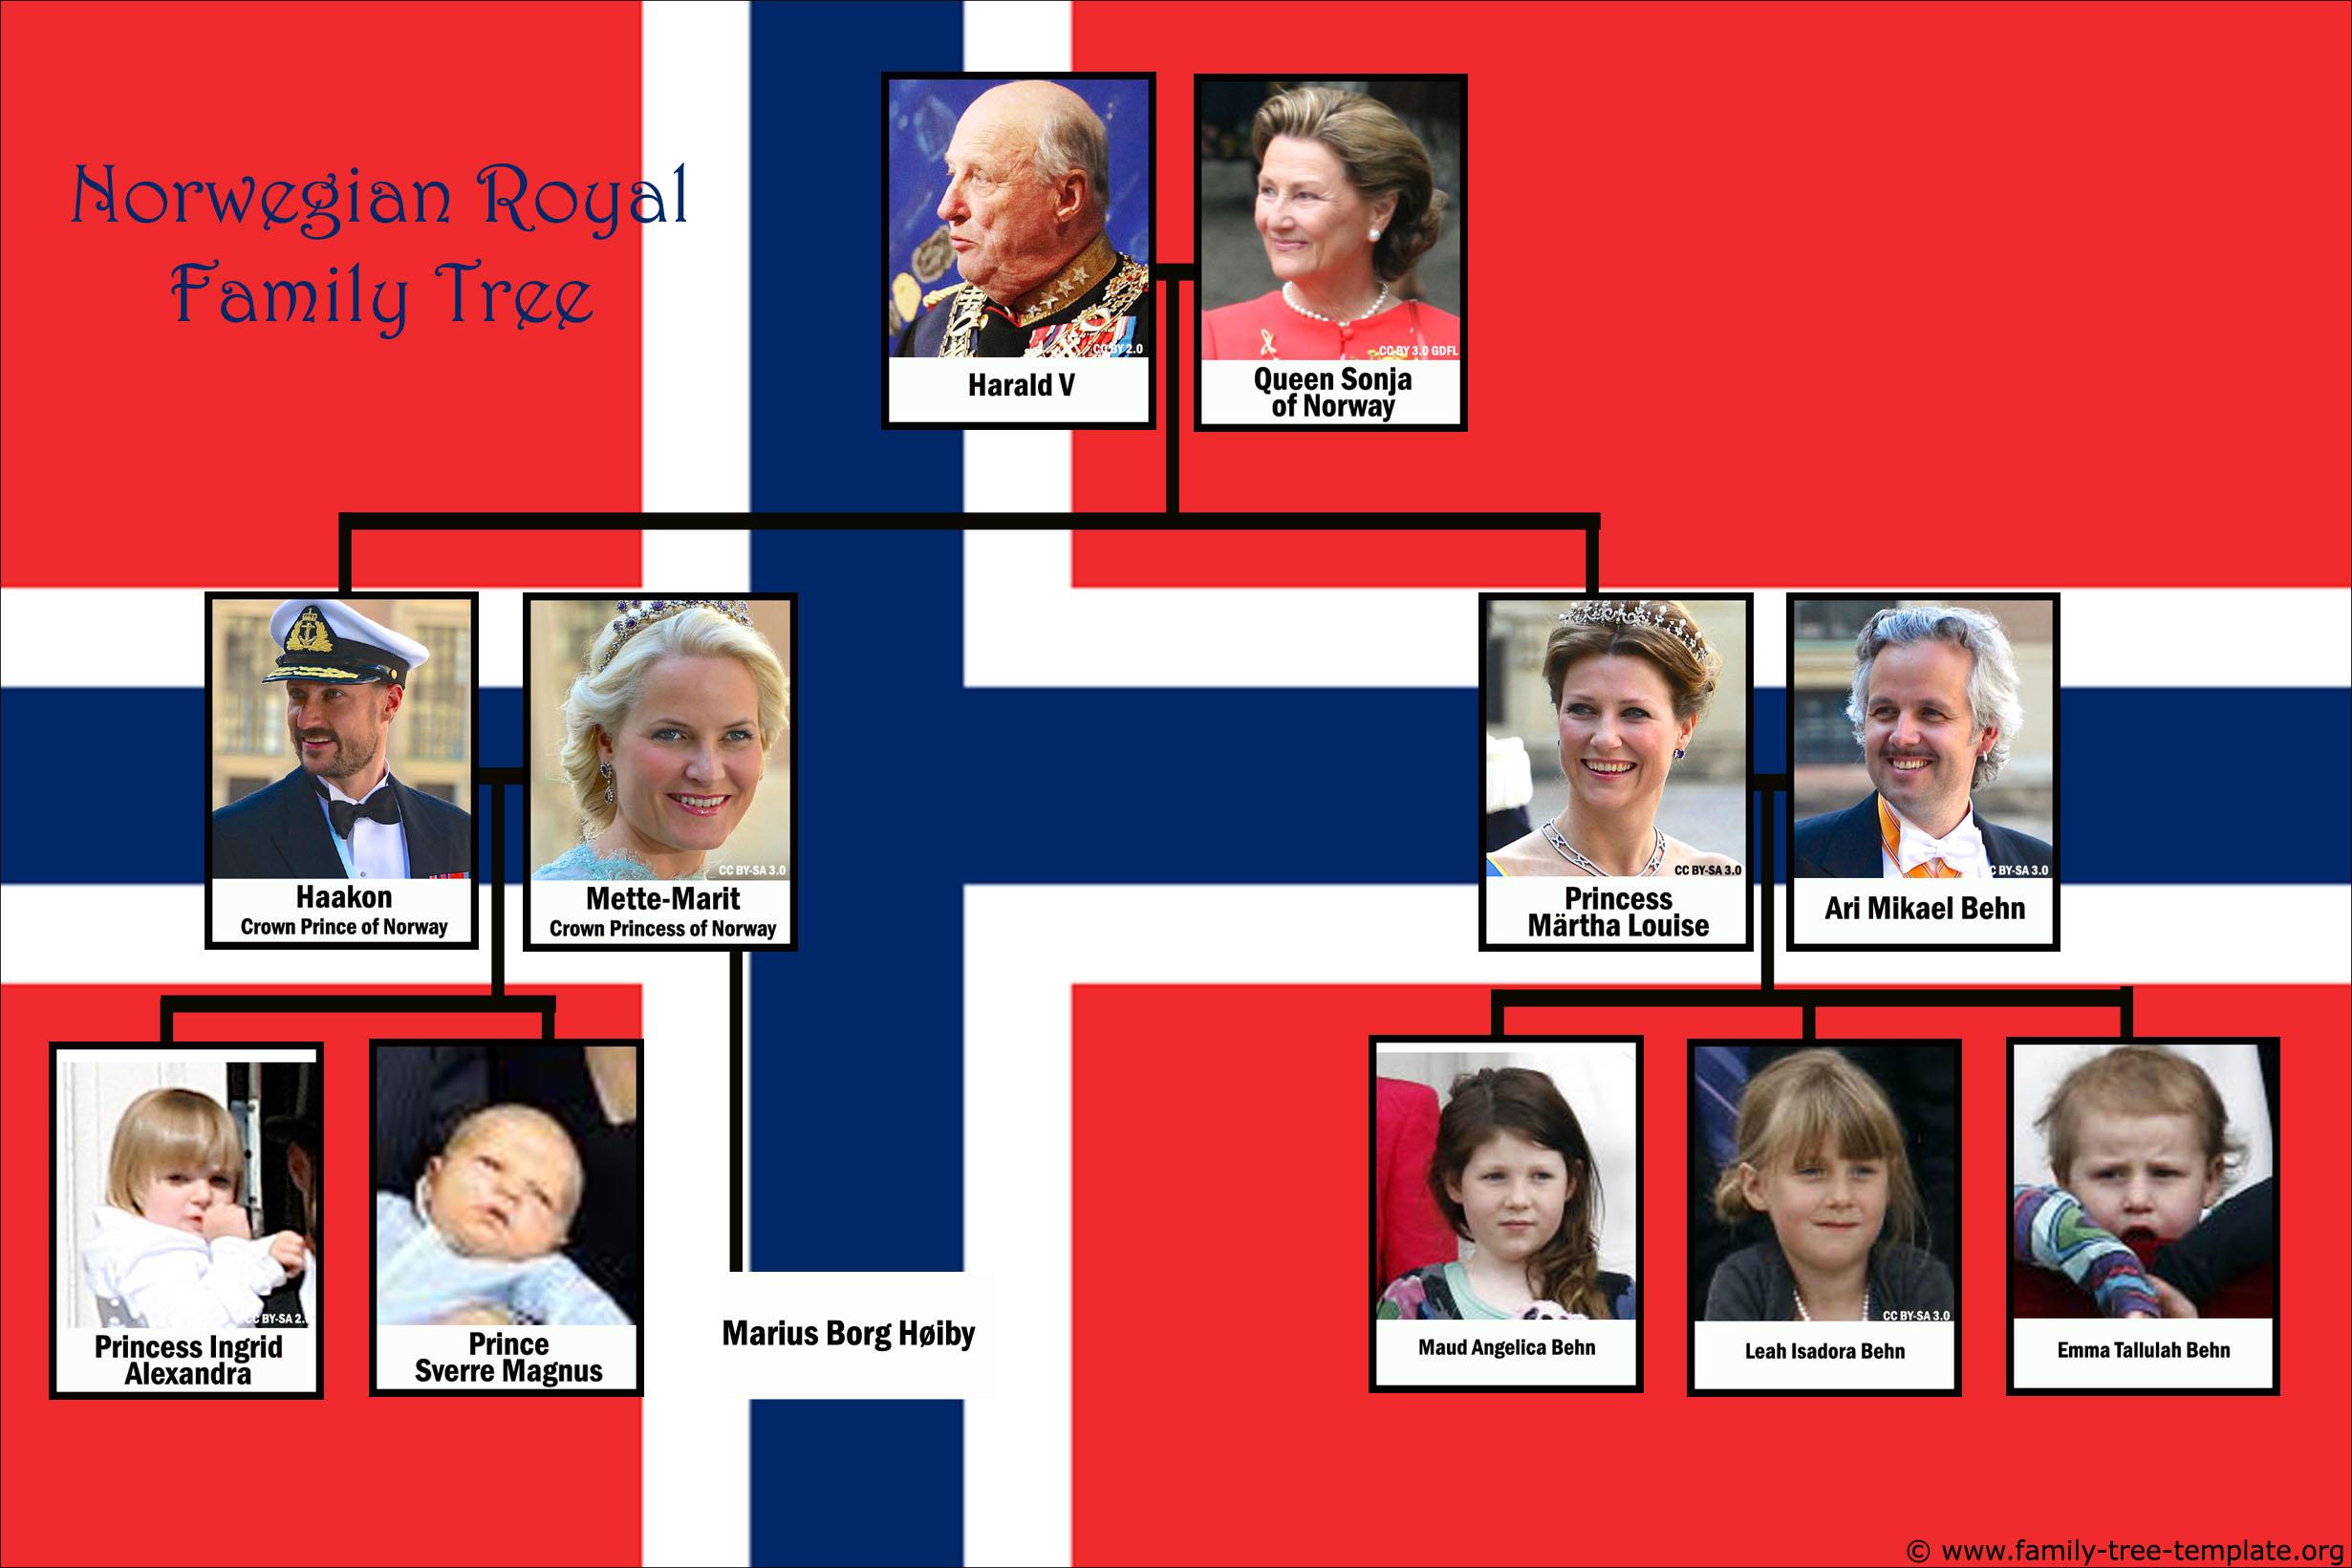 Norwegian royal genealogy tree of King Harald V.